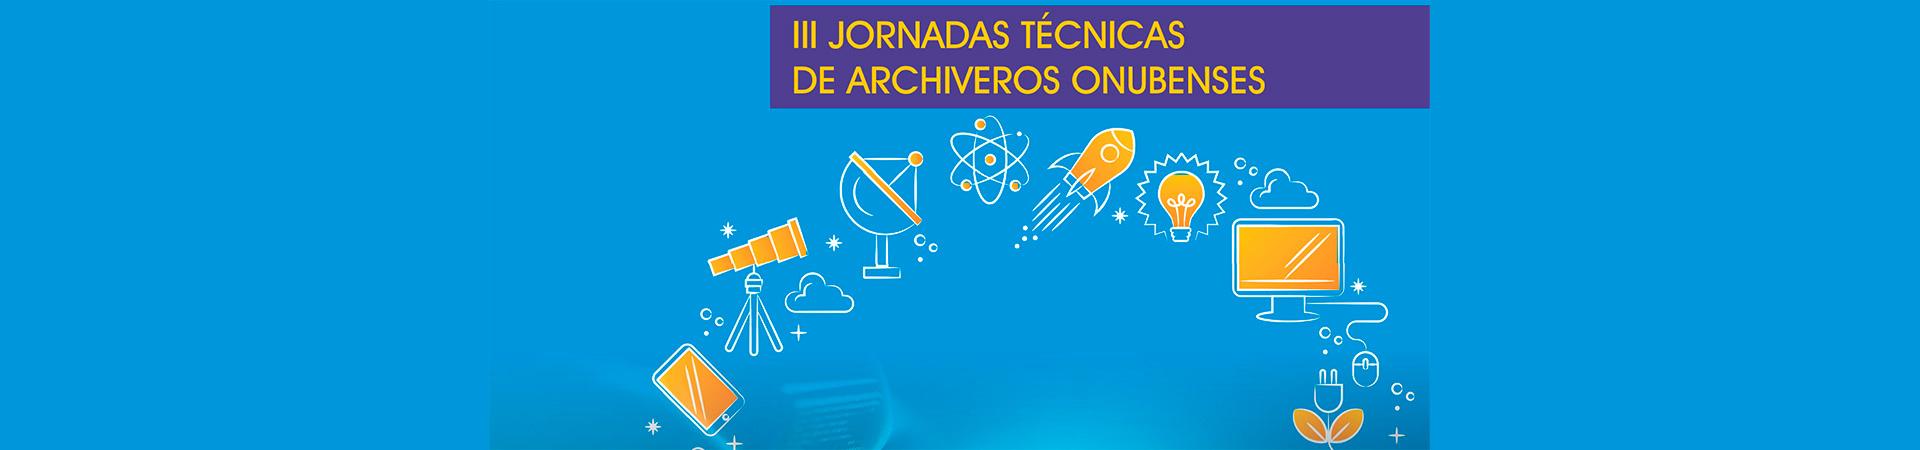 III Jornadas técnicas de archiveros onubenses